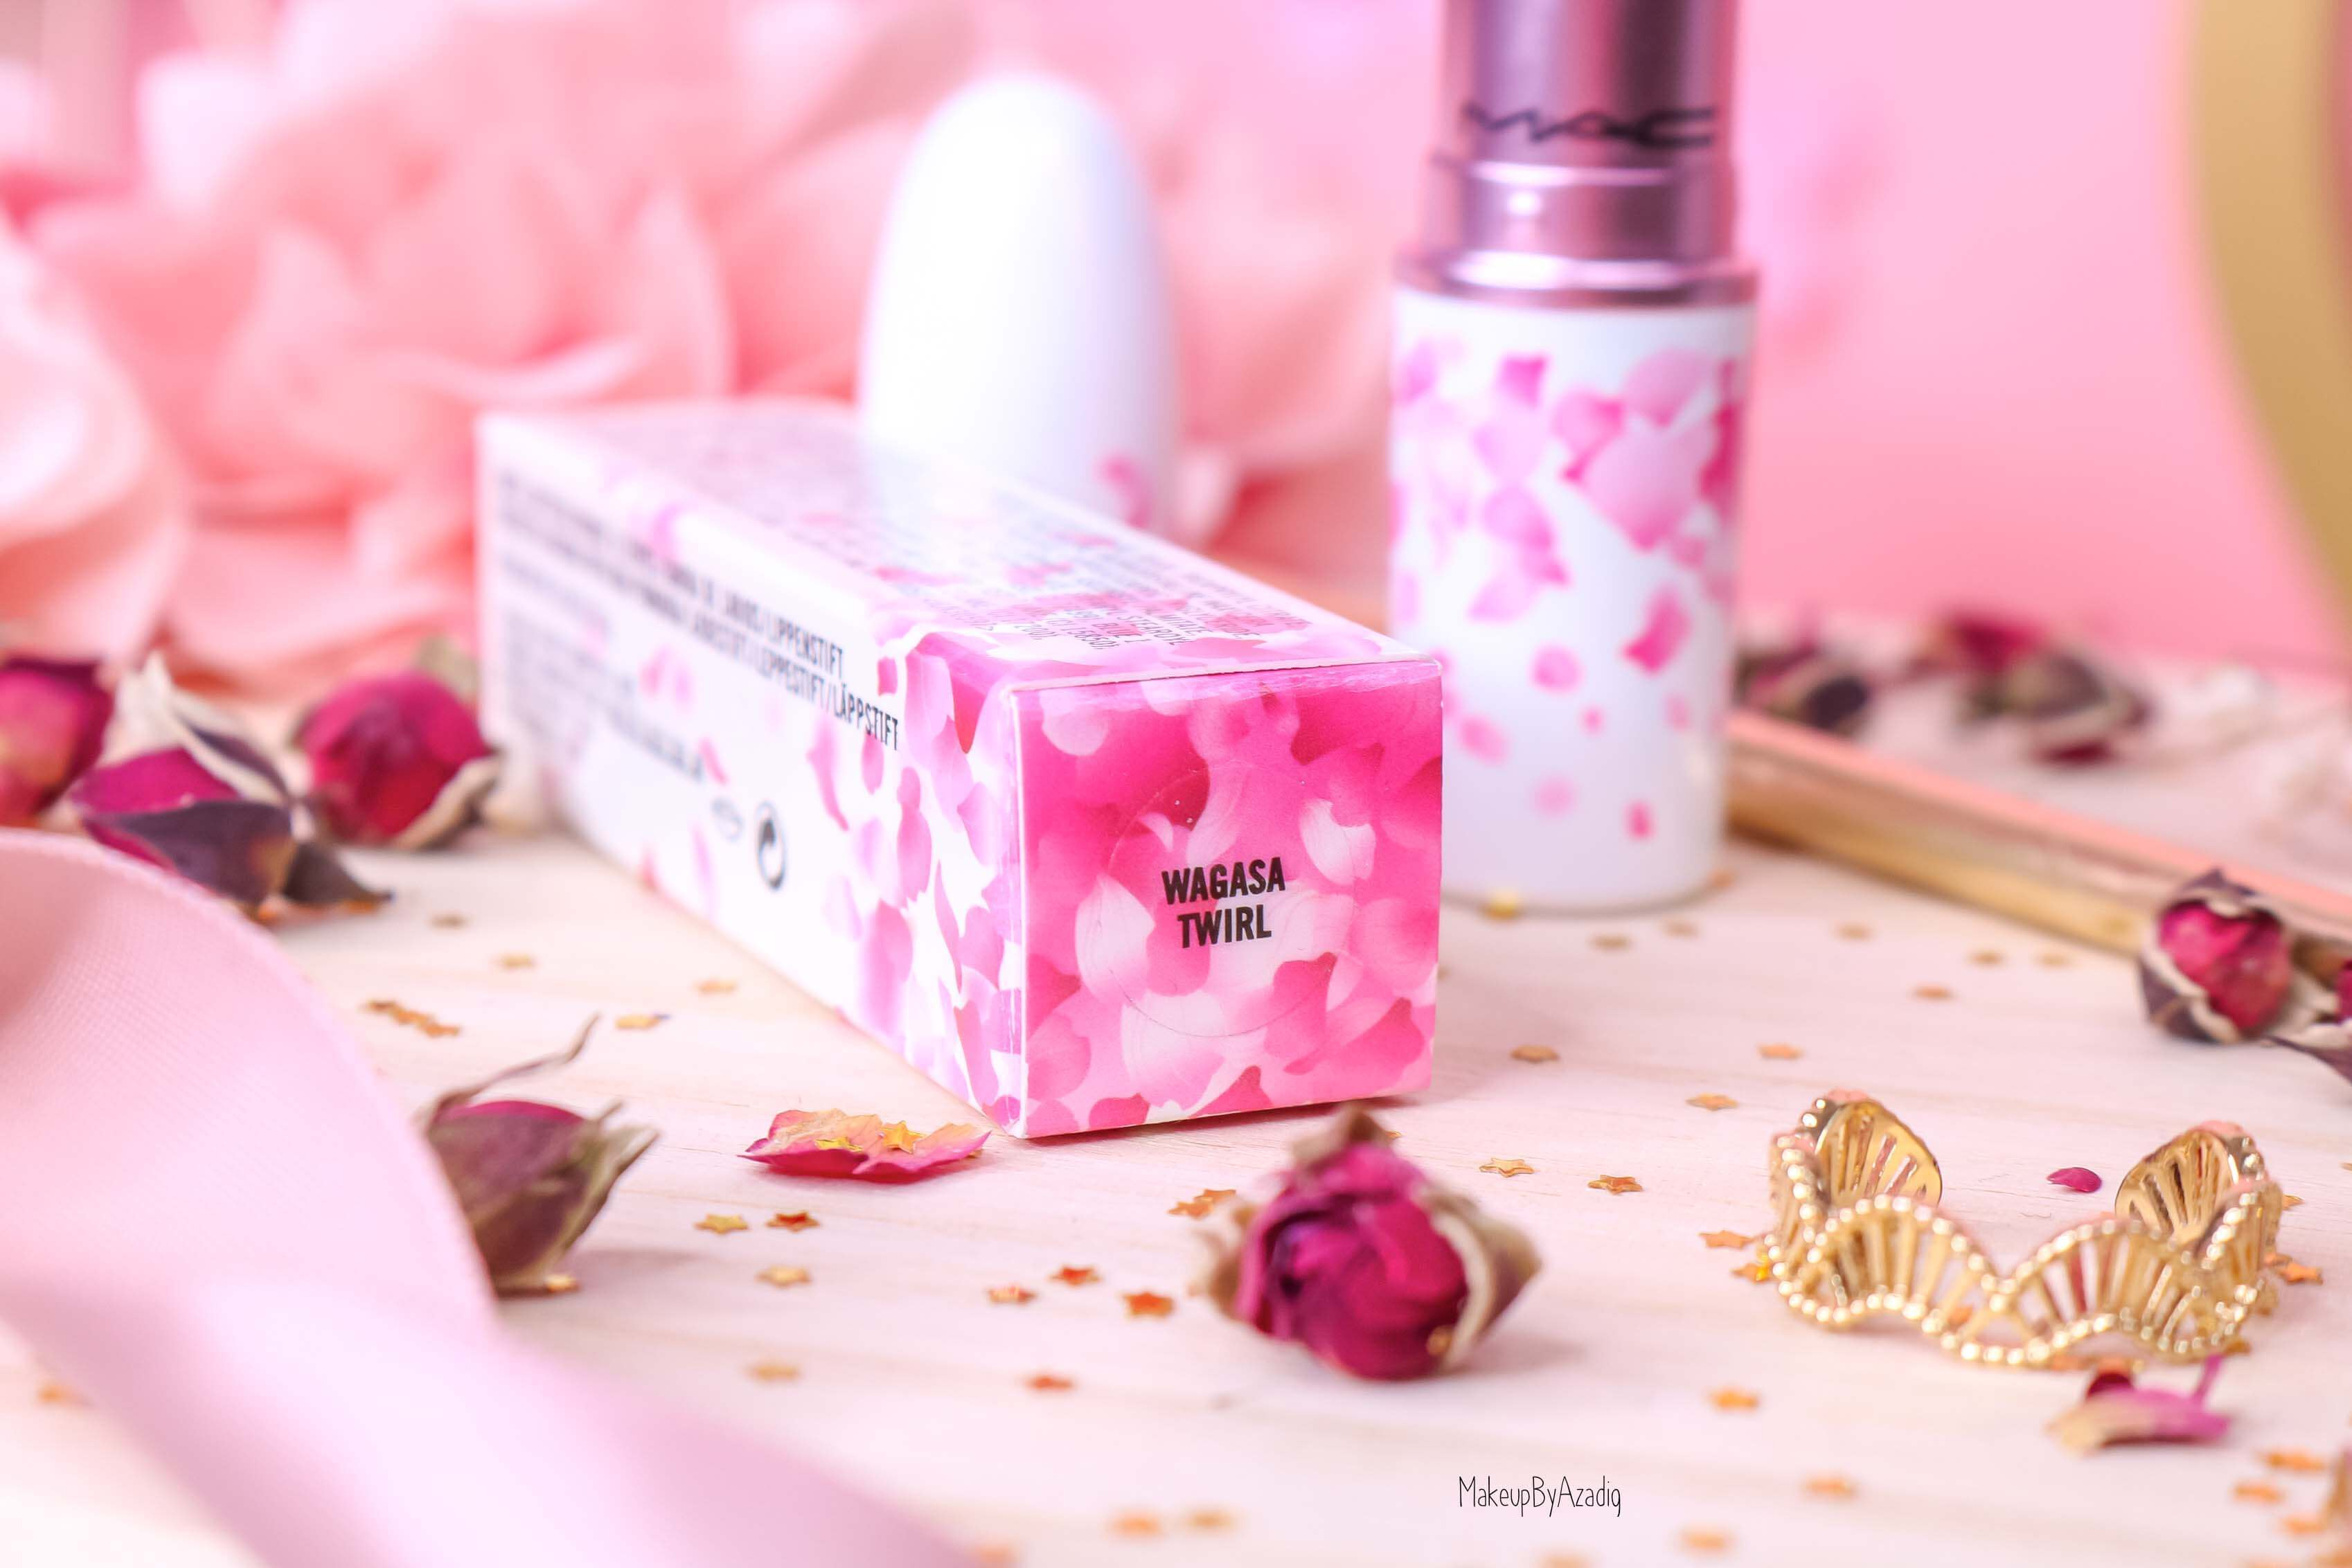 revue-rouge-a-levres-mac-cosmetics-collection-boom-boom-bloom-printemps-makeupbyazadig-avis-swatch-prix-france-wagasa